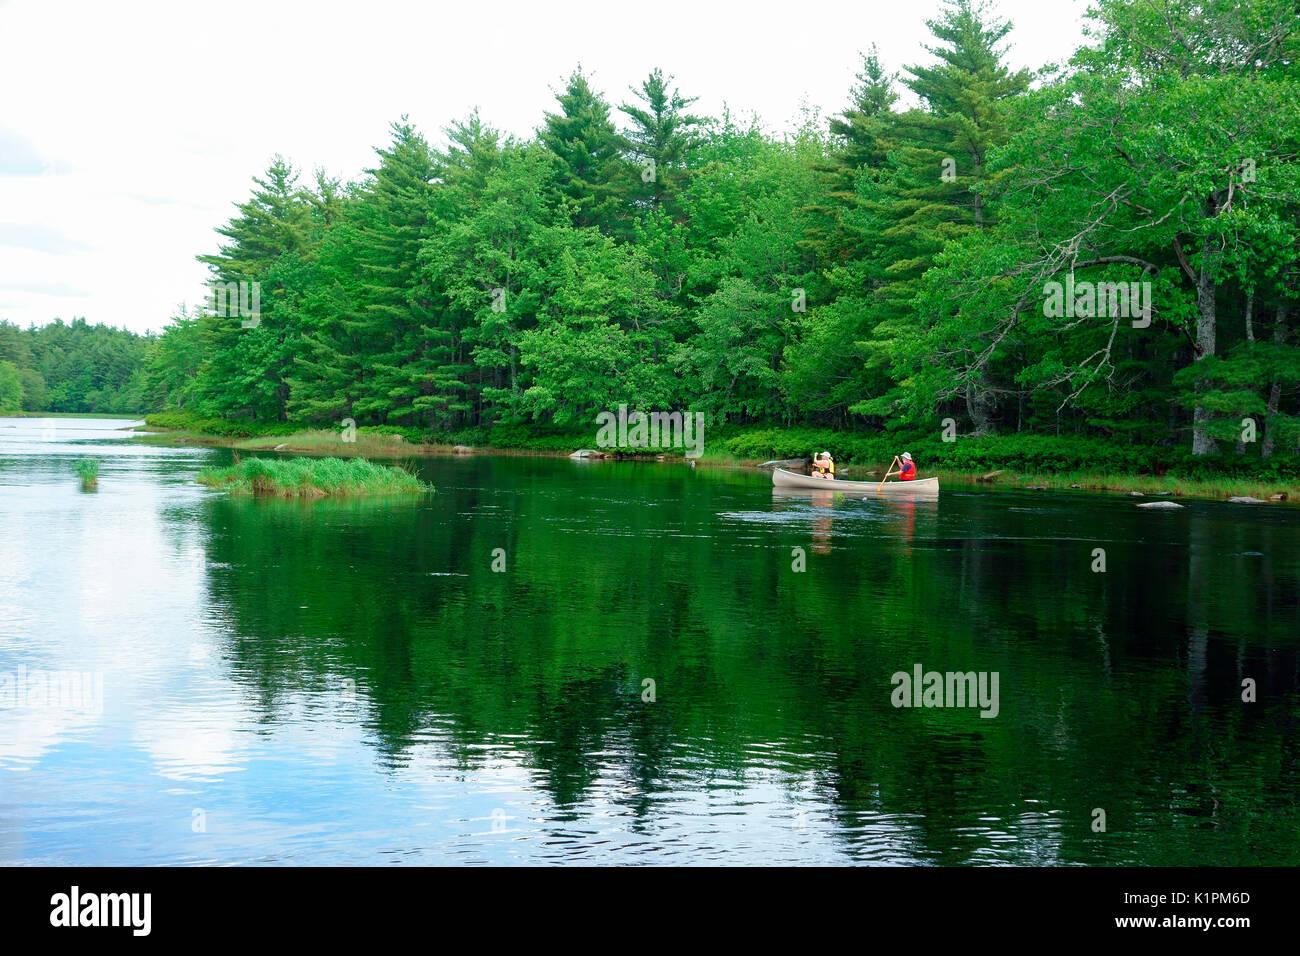 Mersey river, kejimkujik national park, nova scotia, canada - Stock Image